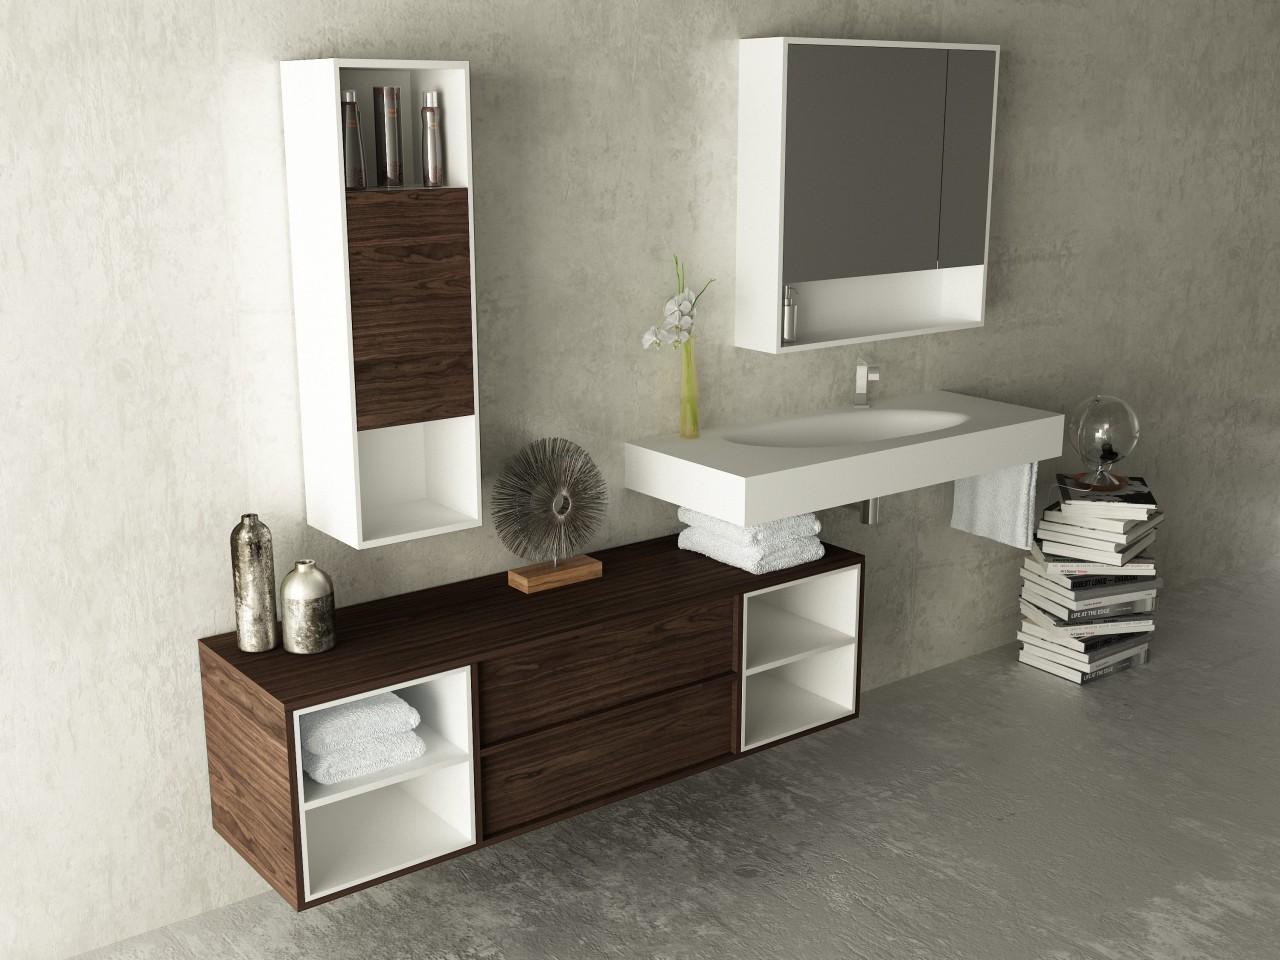 Sun mobiliario ba o ikebe fabrica de muebles de - Encimeras corian precios ...